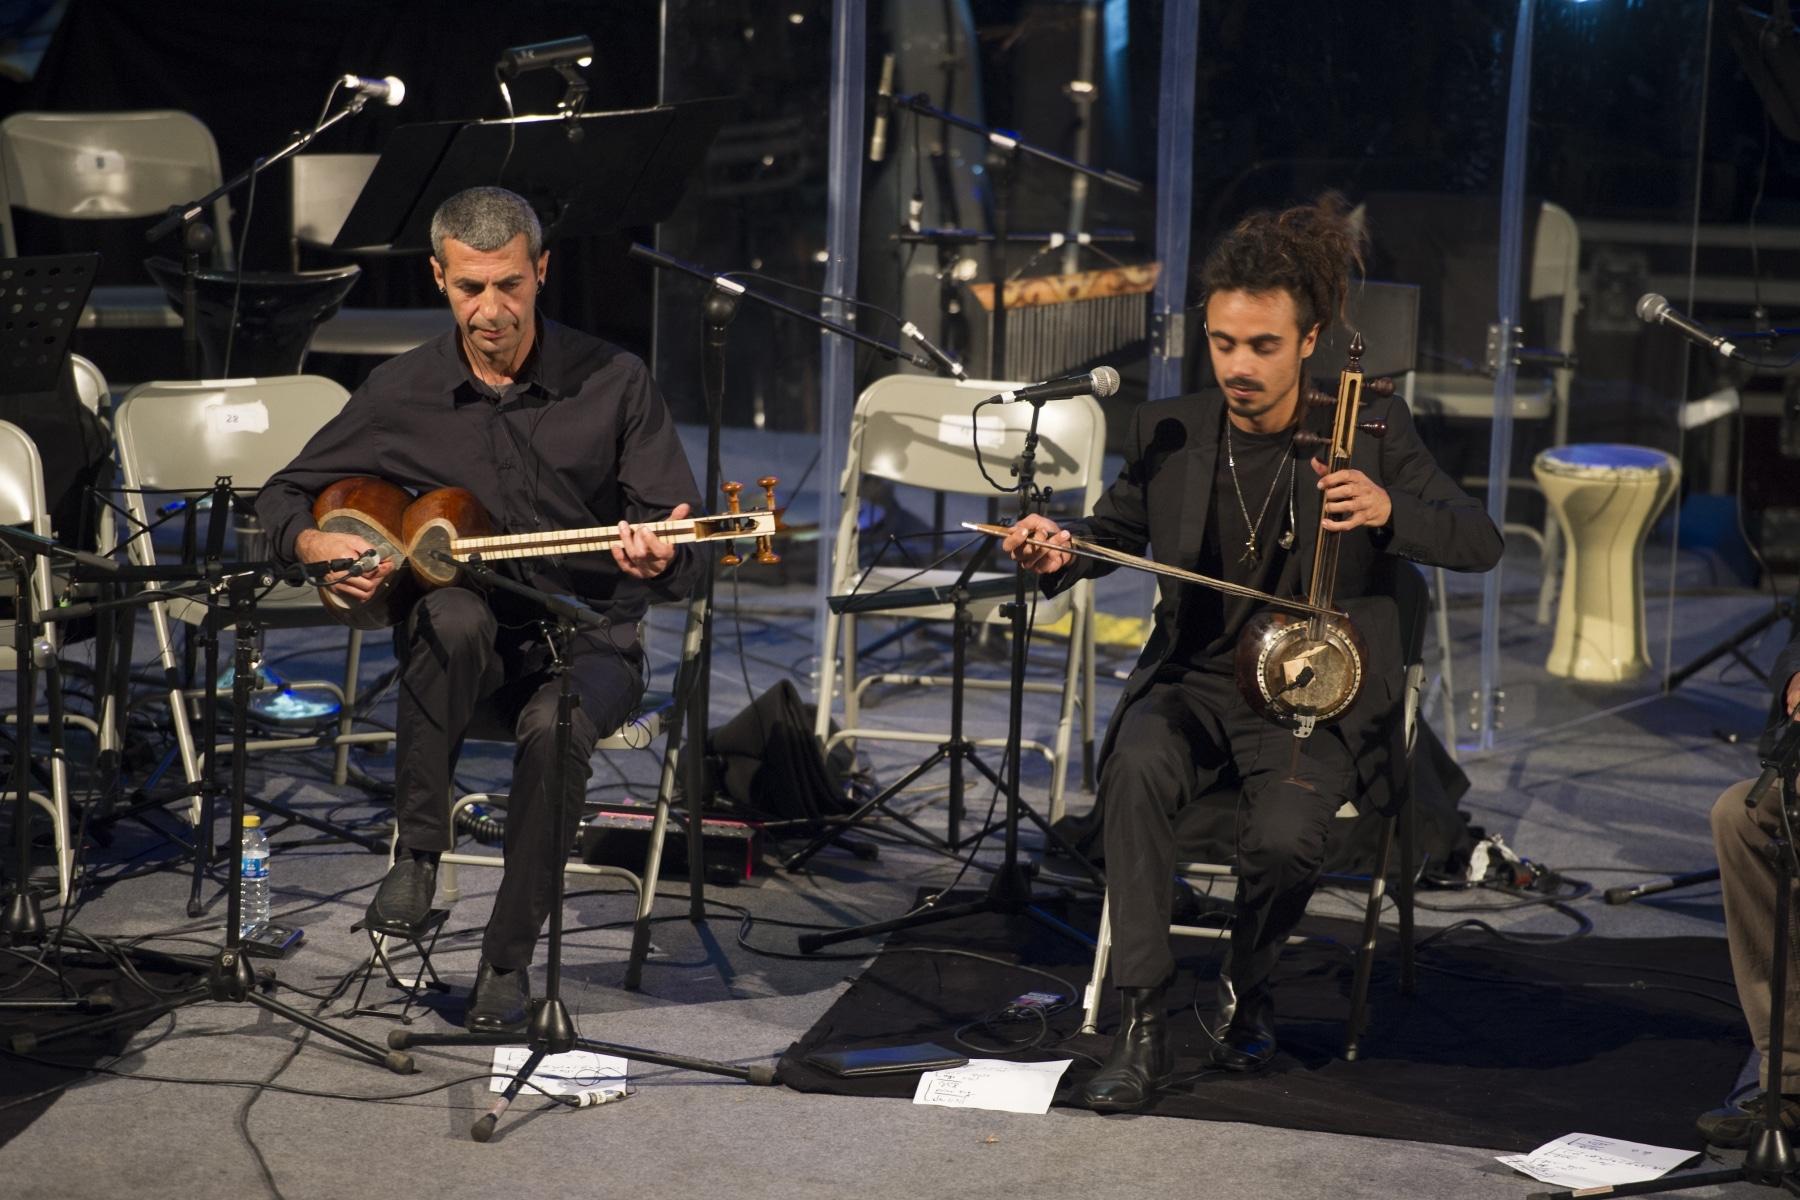 gibraltar-world-music-festival-dia-2-mark-eliyahu-ensemble-02_9222700951_o